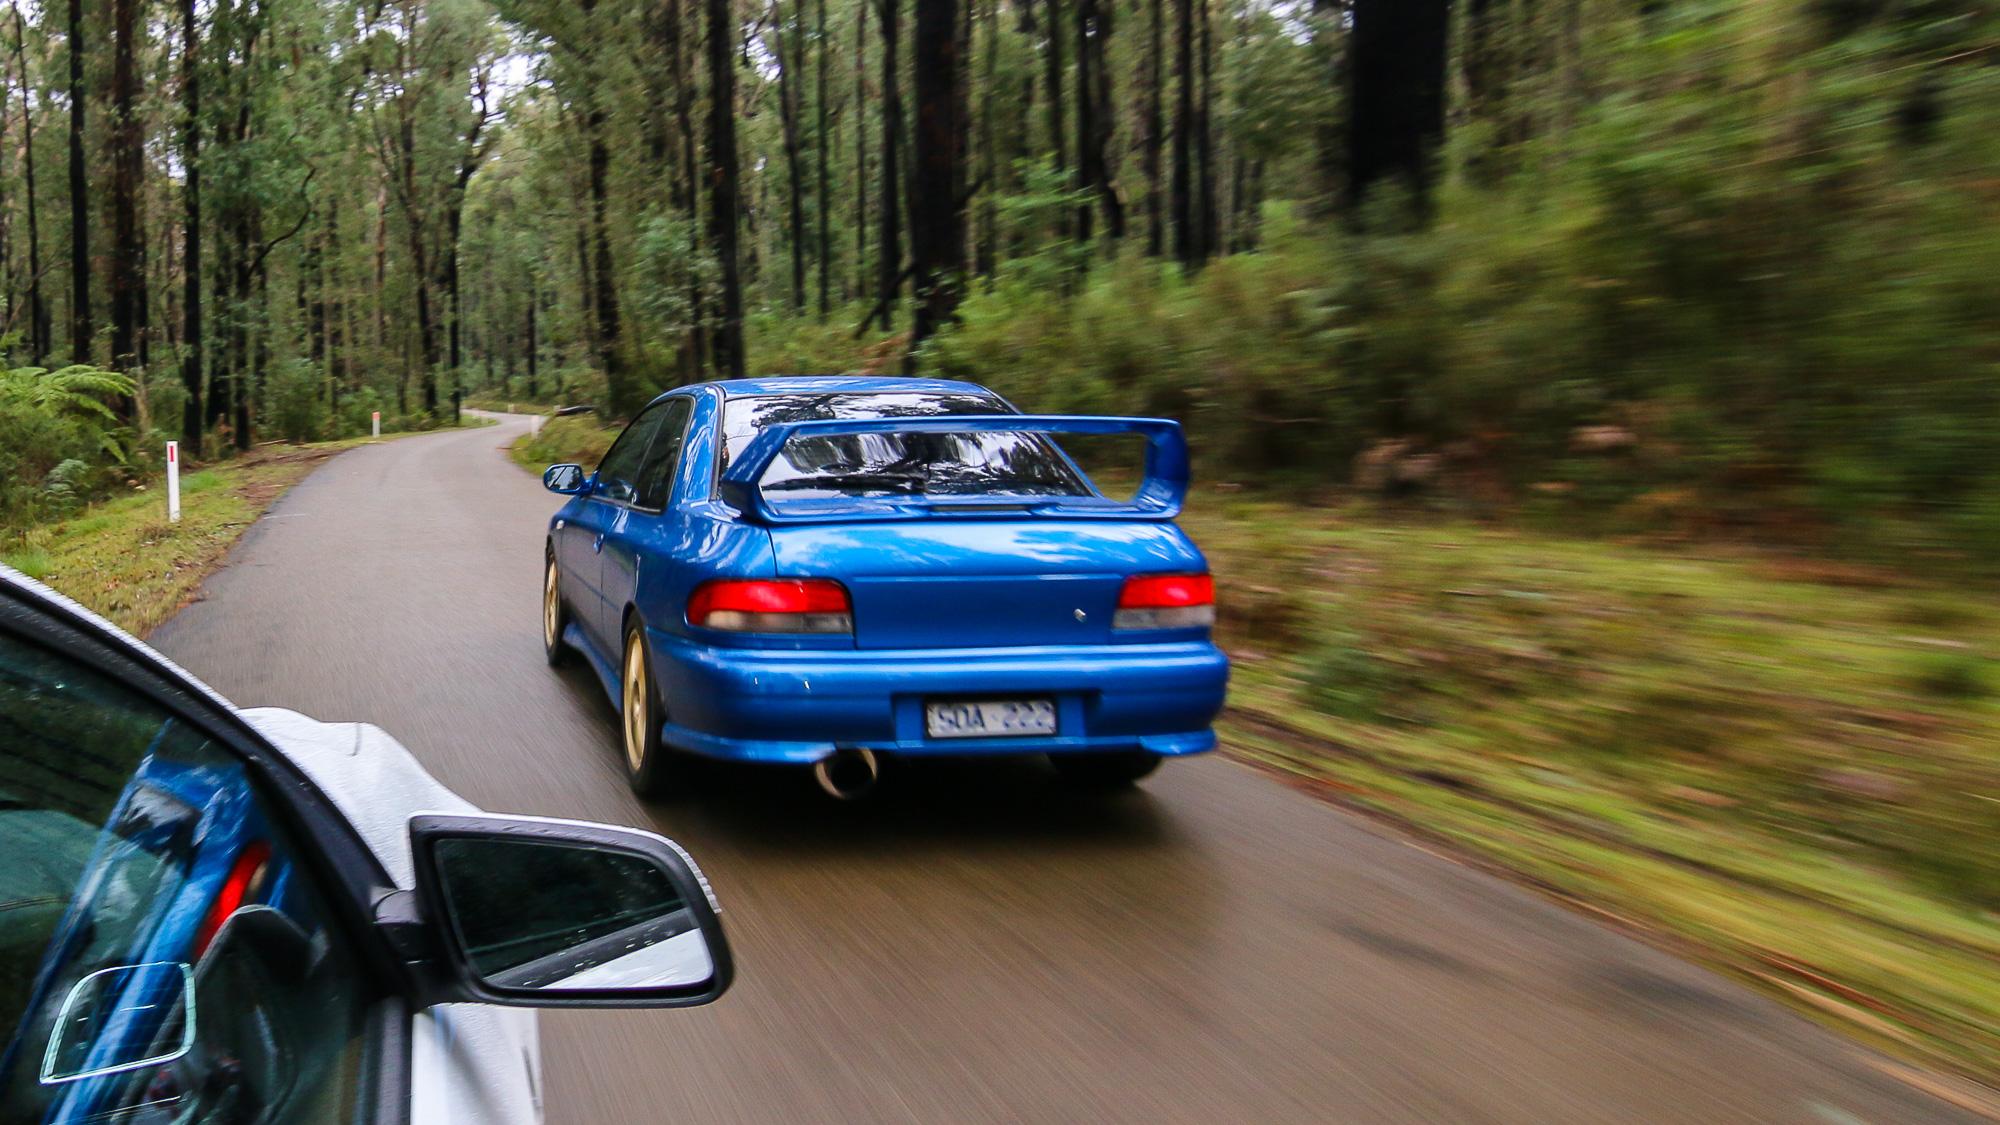 2017 Subaru Wrx >> Subaru WRX STI Old v New Comparison: 2015 sedan v 1999 two-door - Photos (1 of 54)